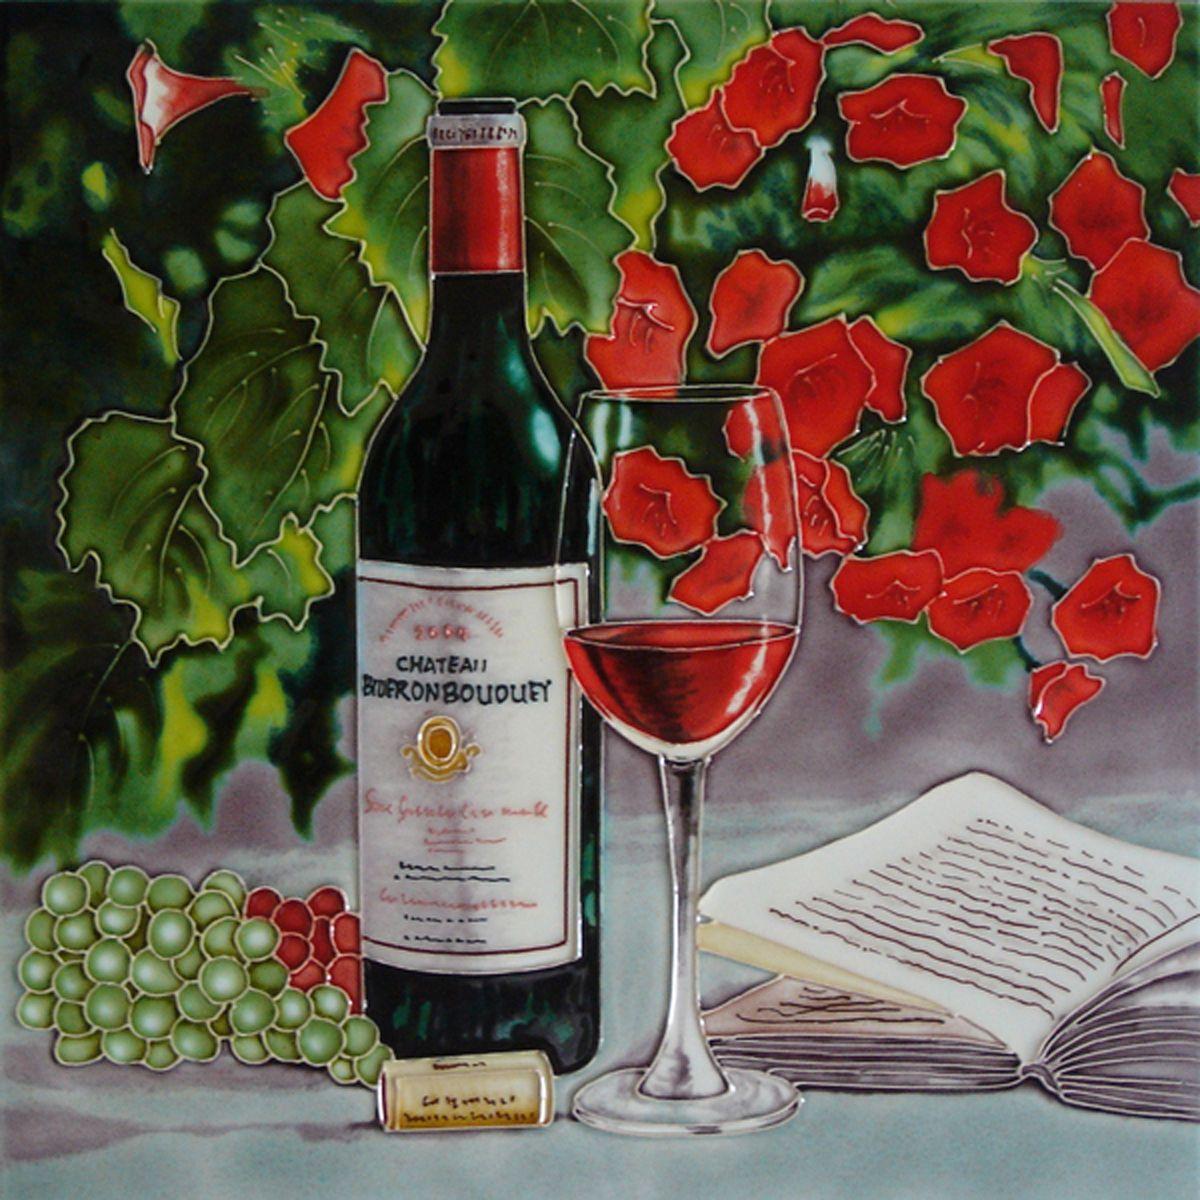 Decorative Ceramic Tiles Kitchen Fascinating Red Wine & Red Flowers Decorative Ceramic Kitchen Picture Tile Inspiration